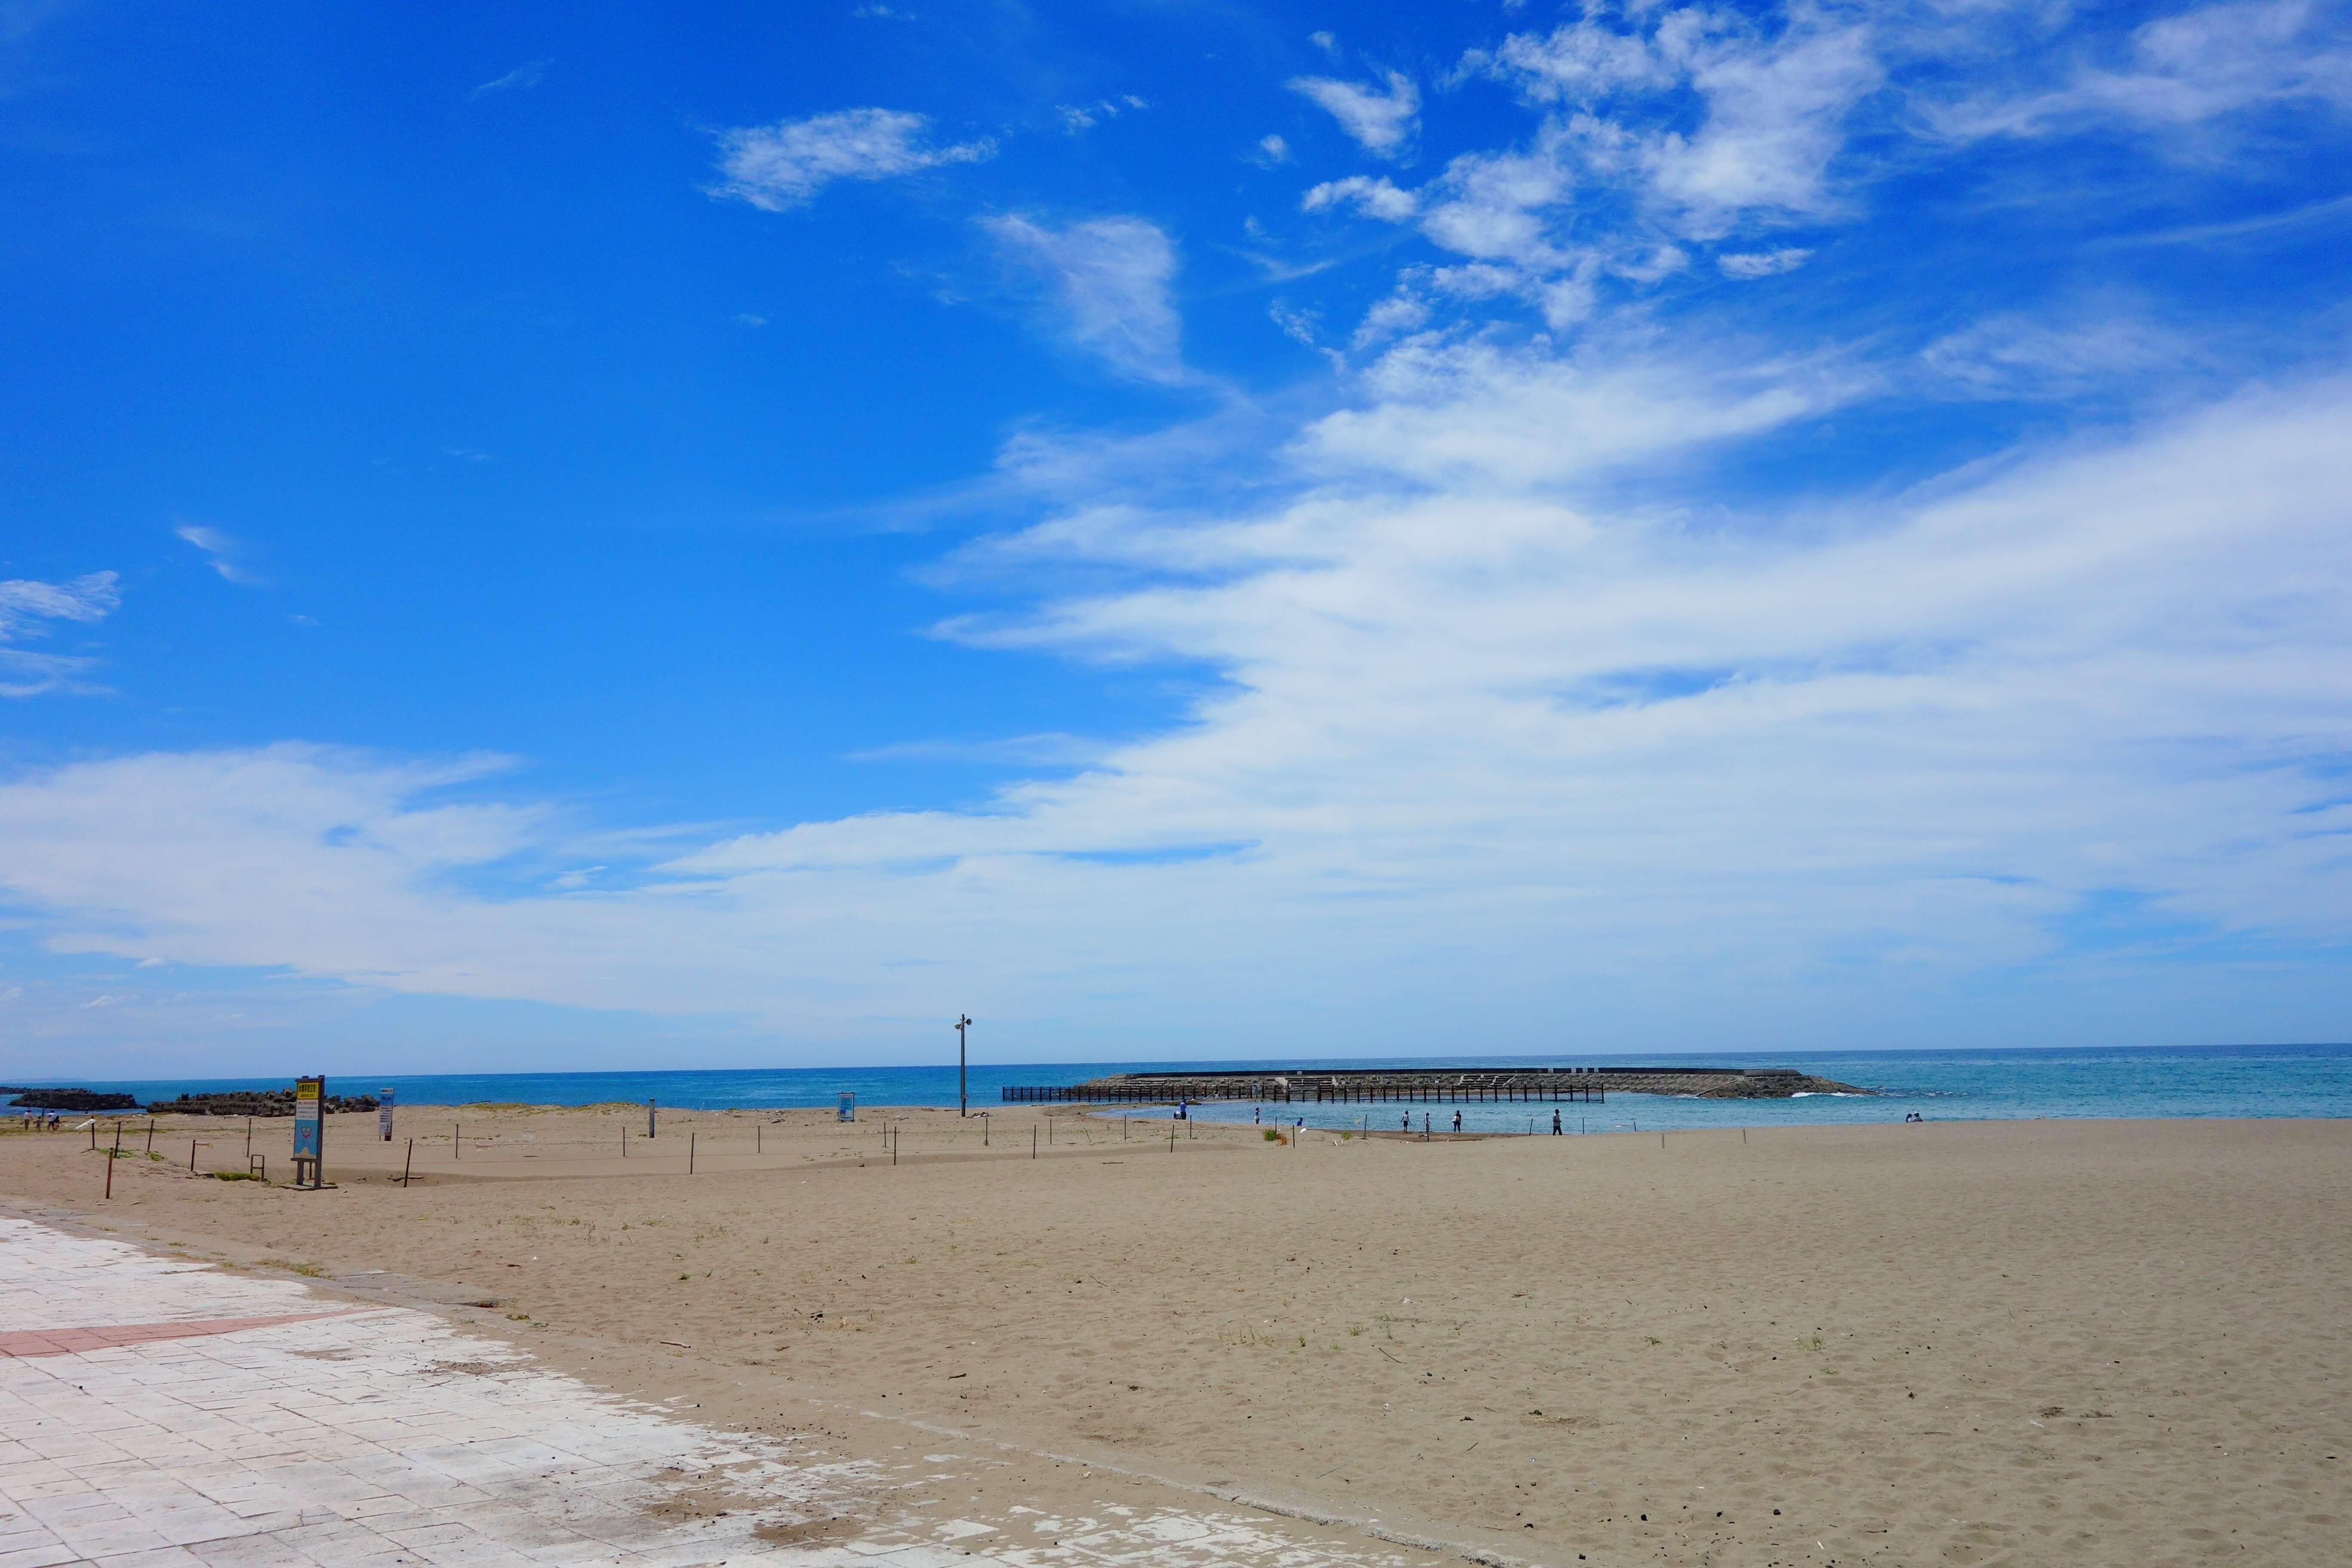 徳光海水浴場青い